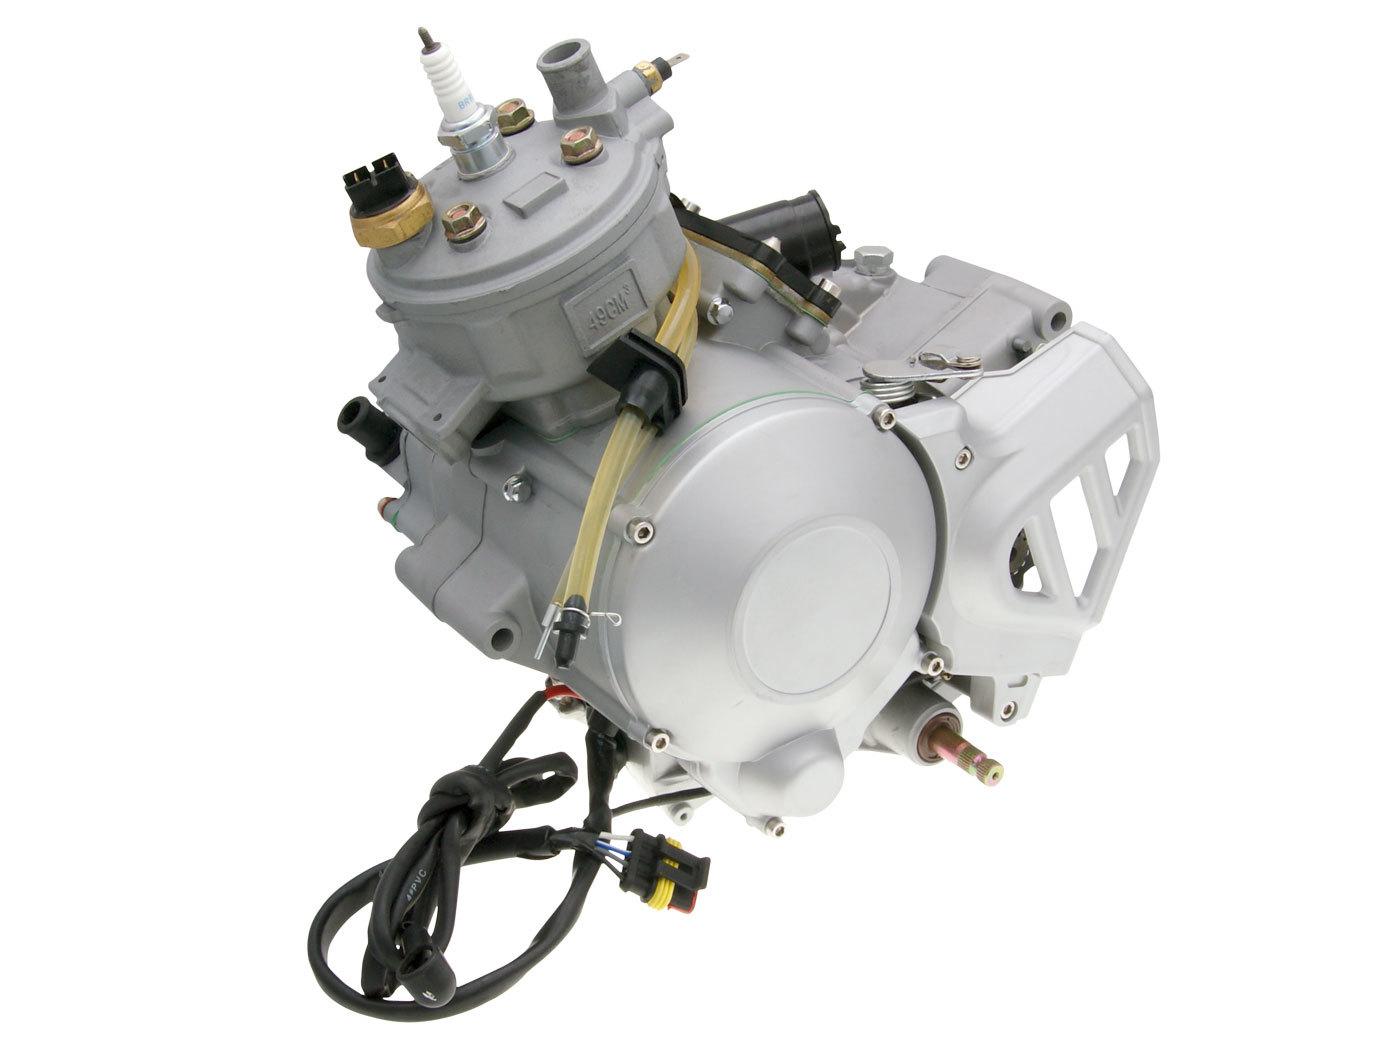 Motor OEM komplett für Generic Trigger mit E-Start-RP34958